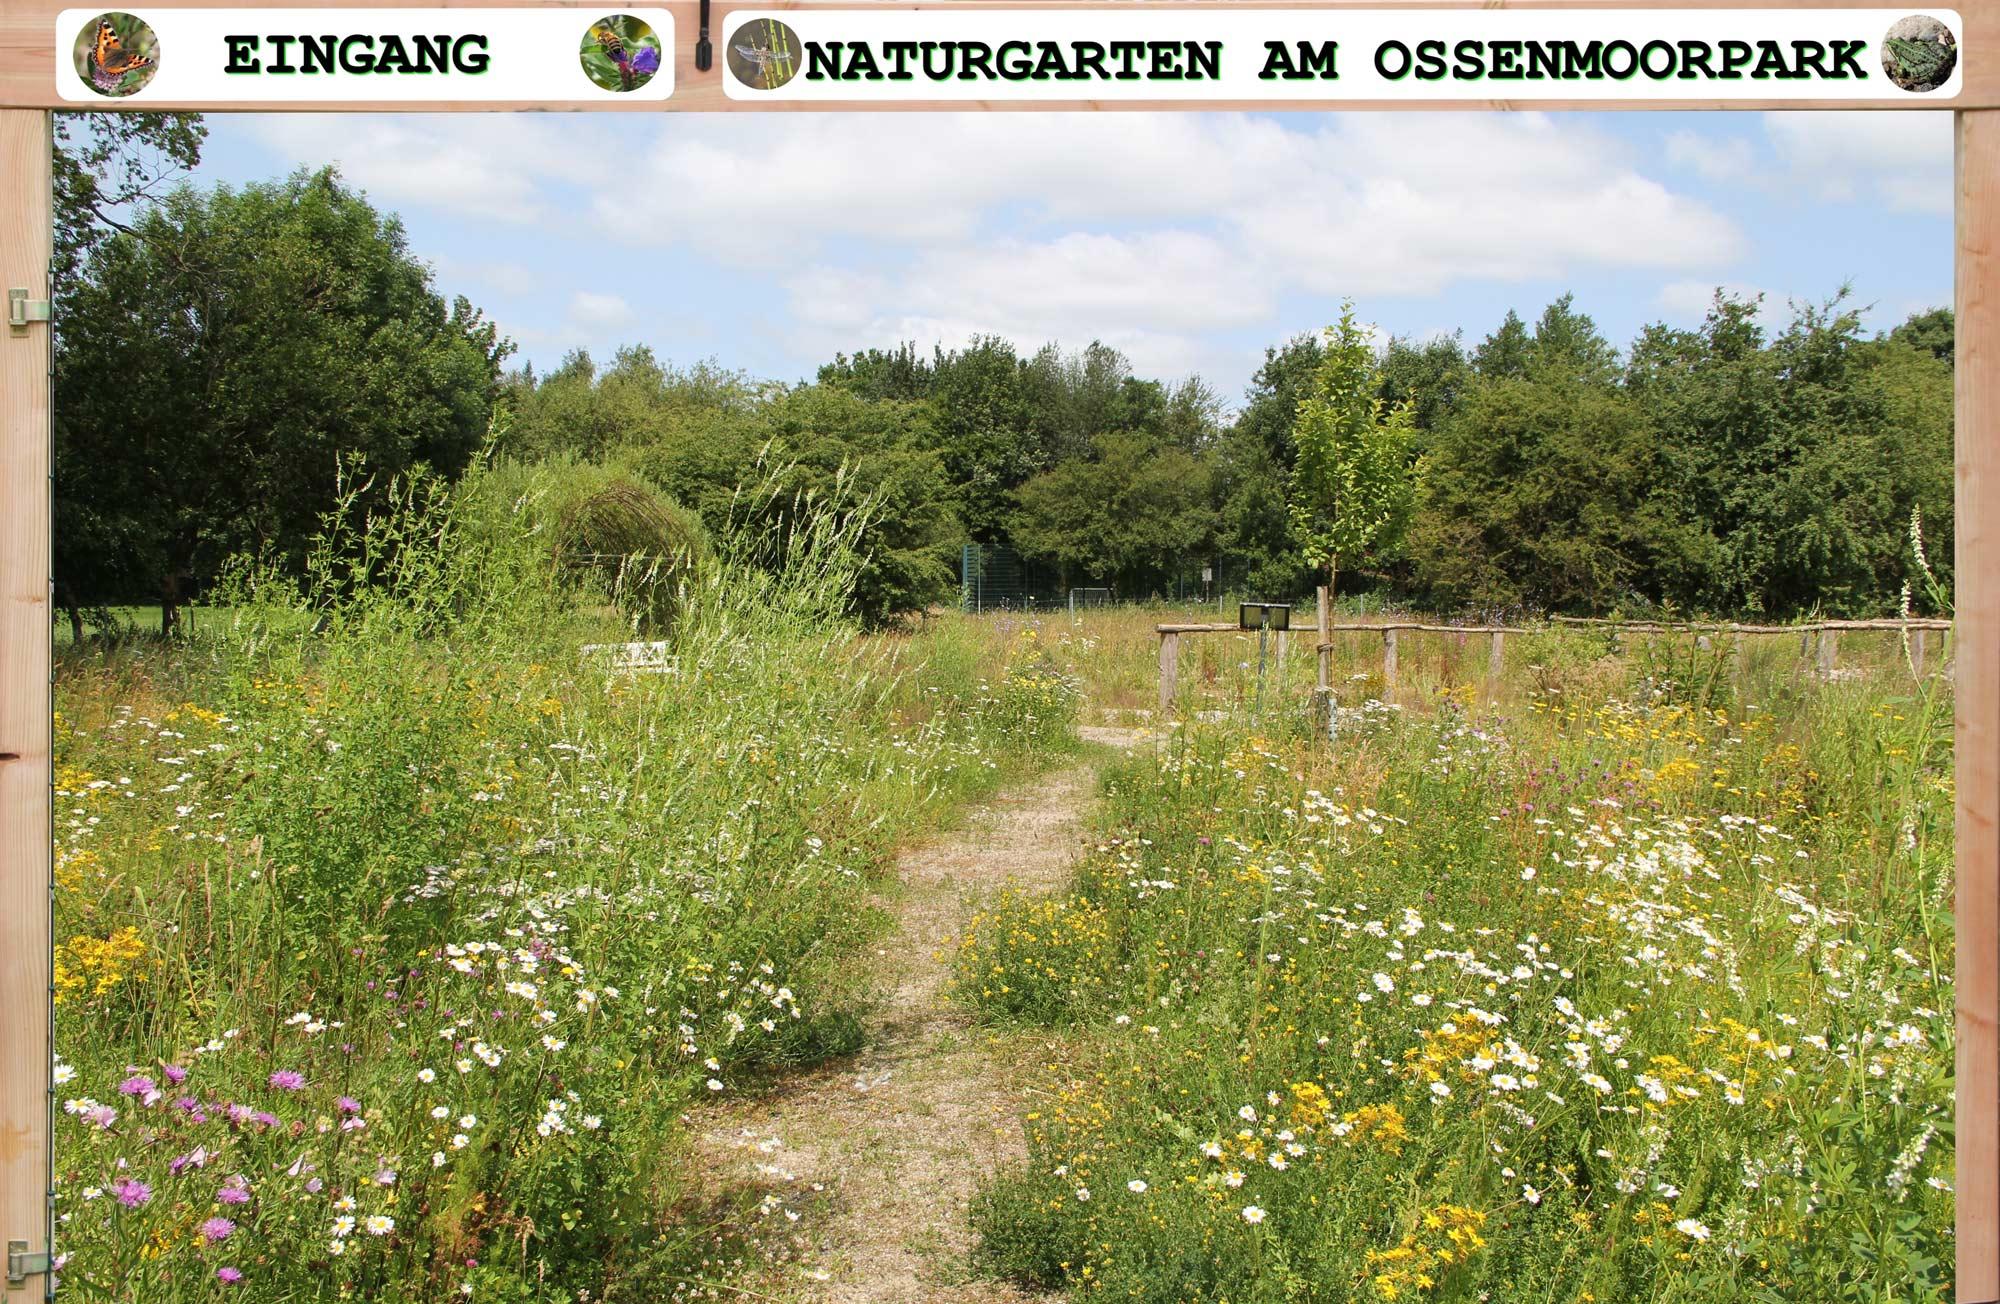 Eingang-Naturgarten